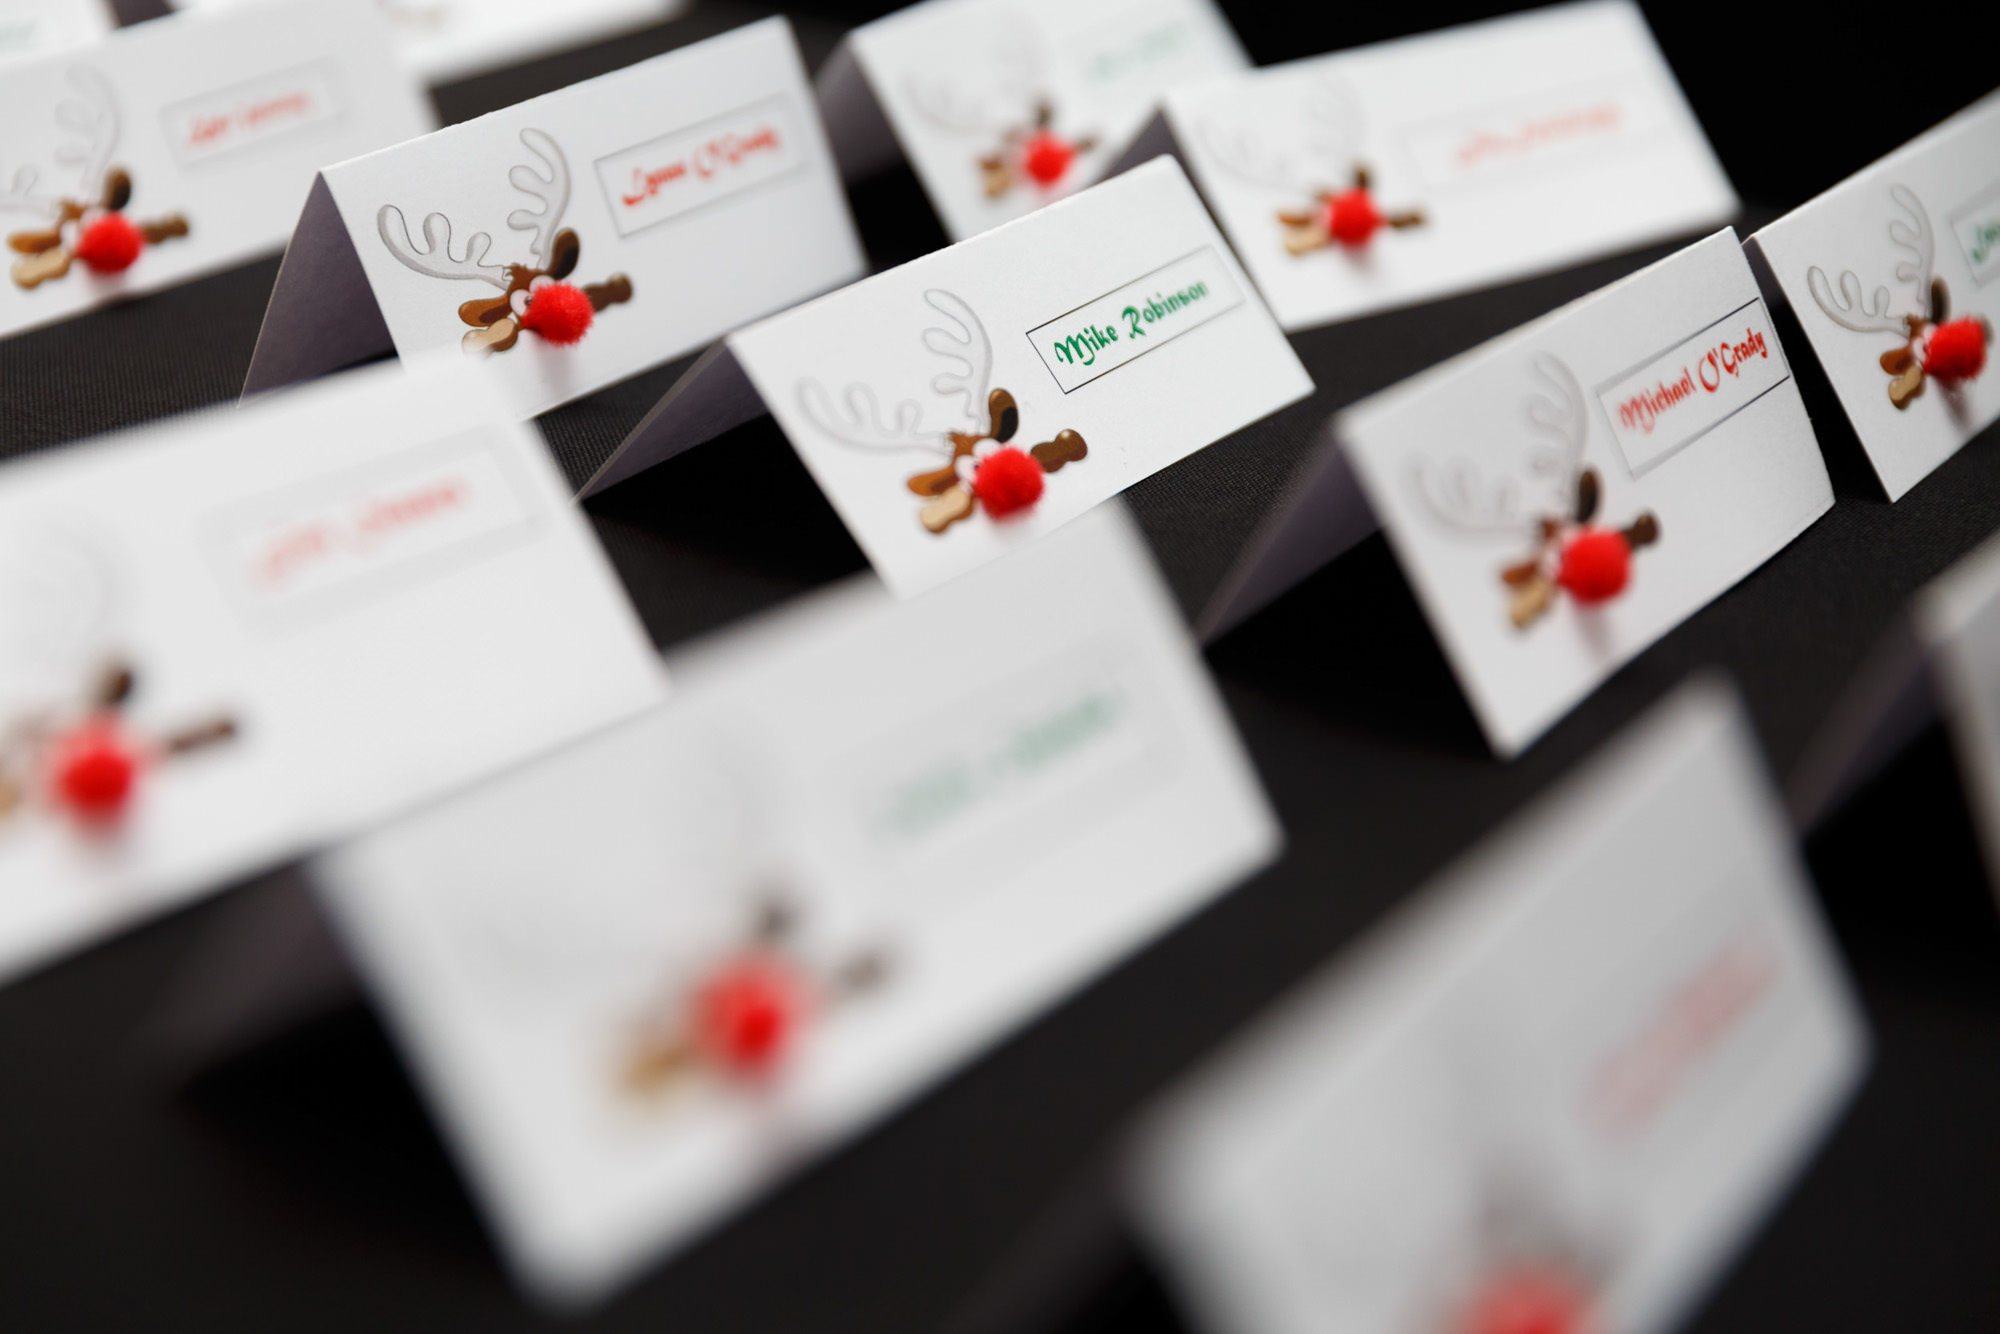 ChristmasParty-Boulting-15Dec18-TangerineEventPhotography-5.jpg